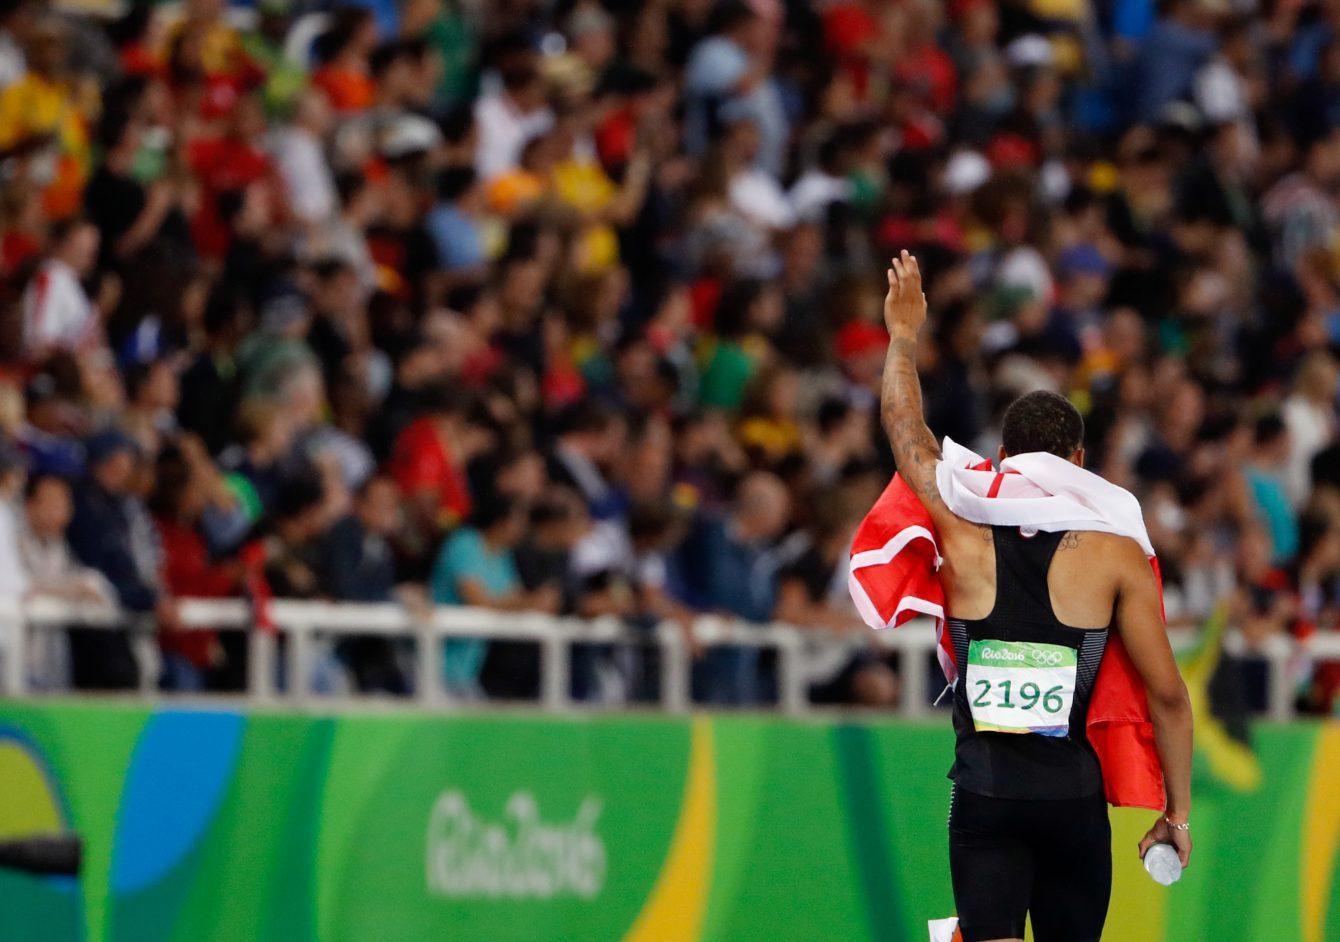 Andre De Grasse, Rio 2016. August 18, 2016. COC Photo/Stephen Hosier